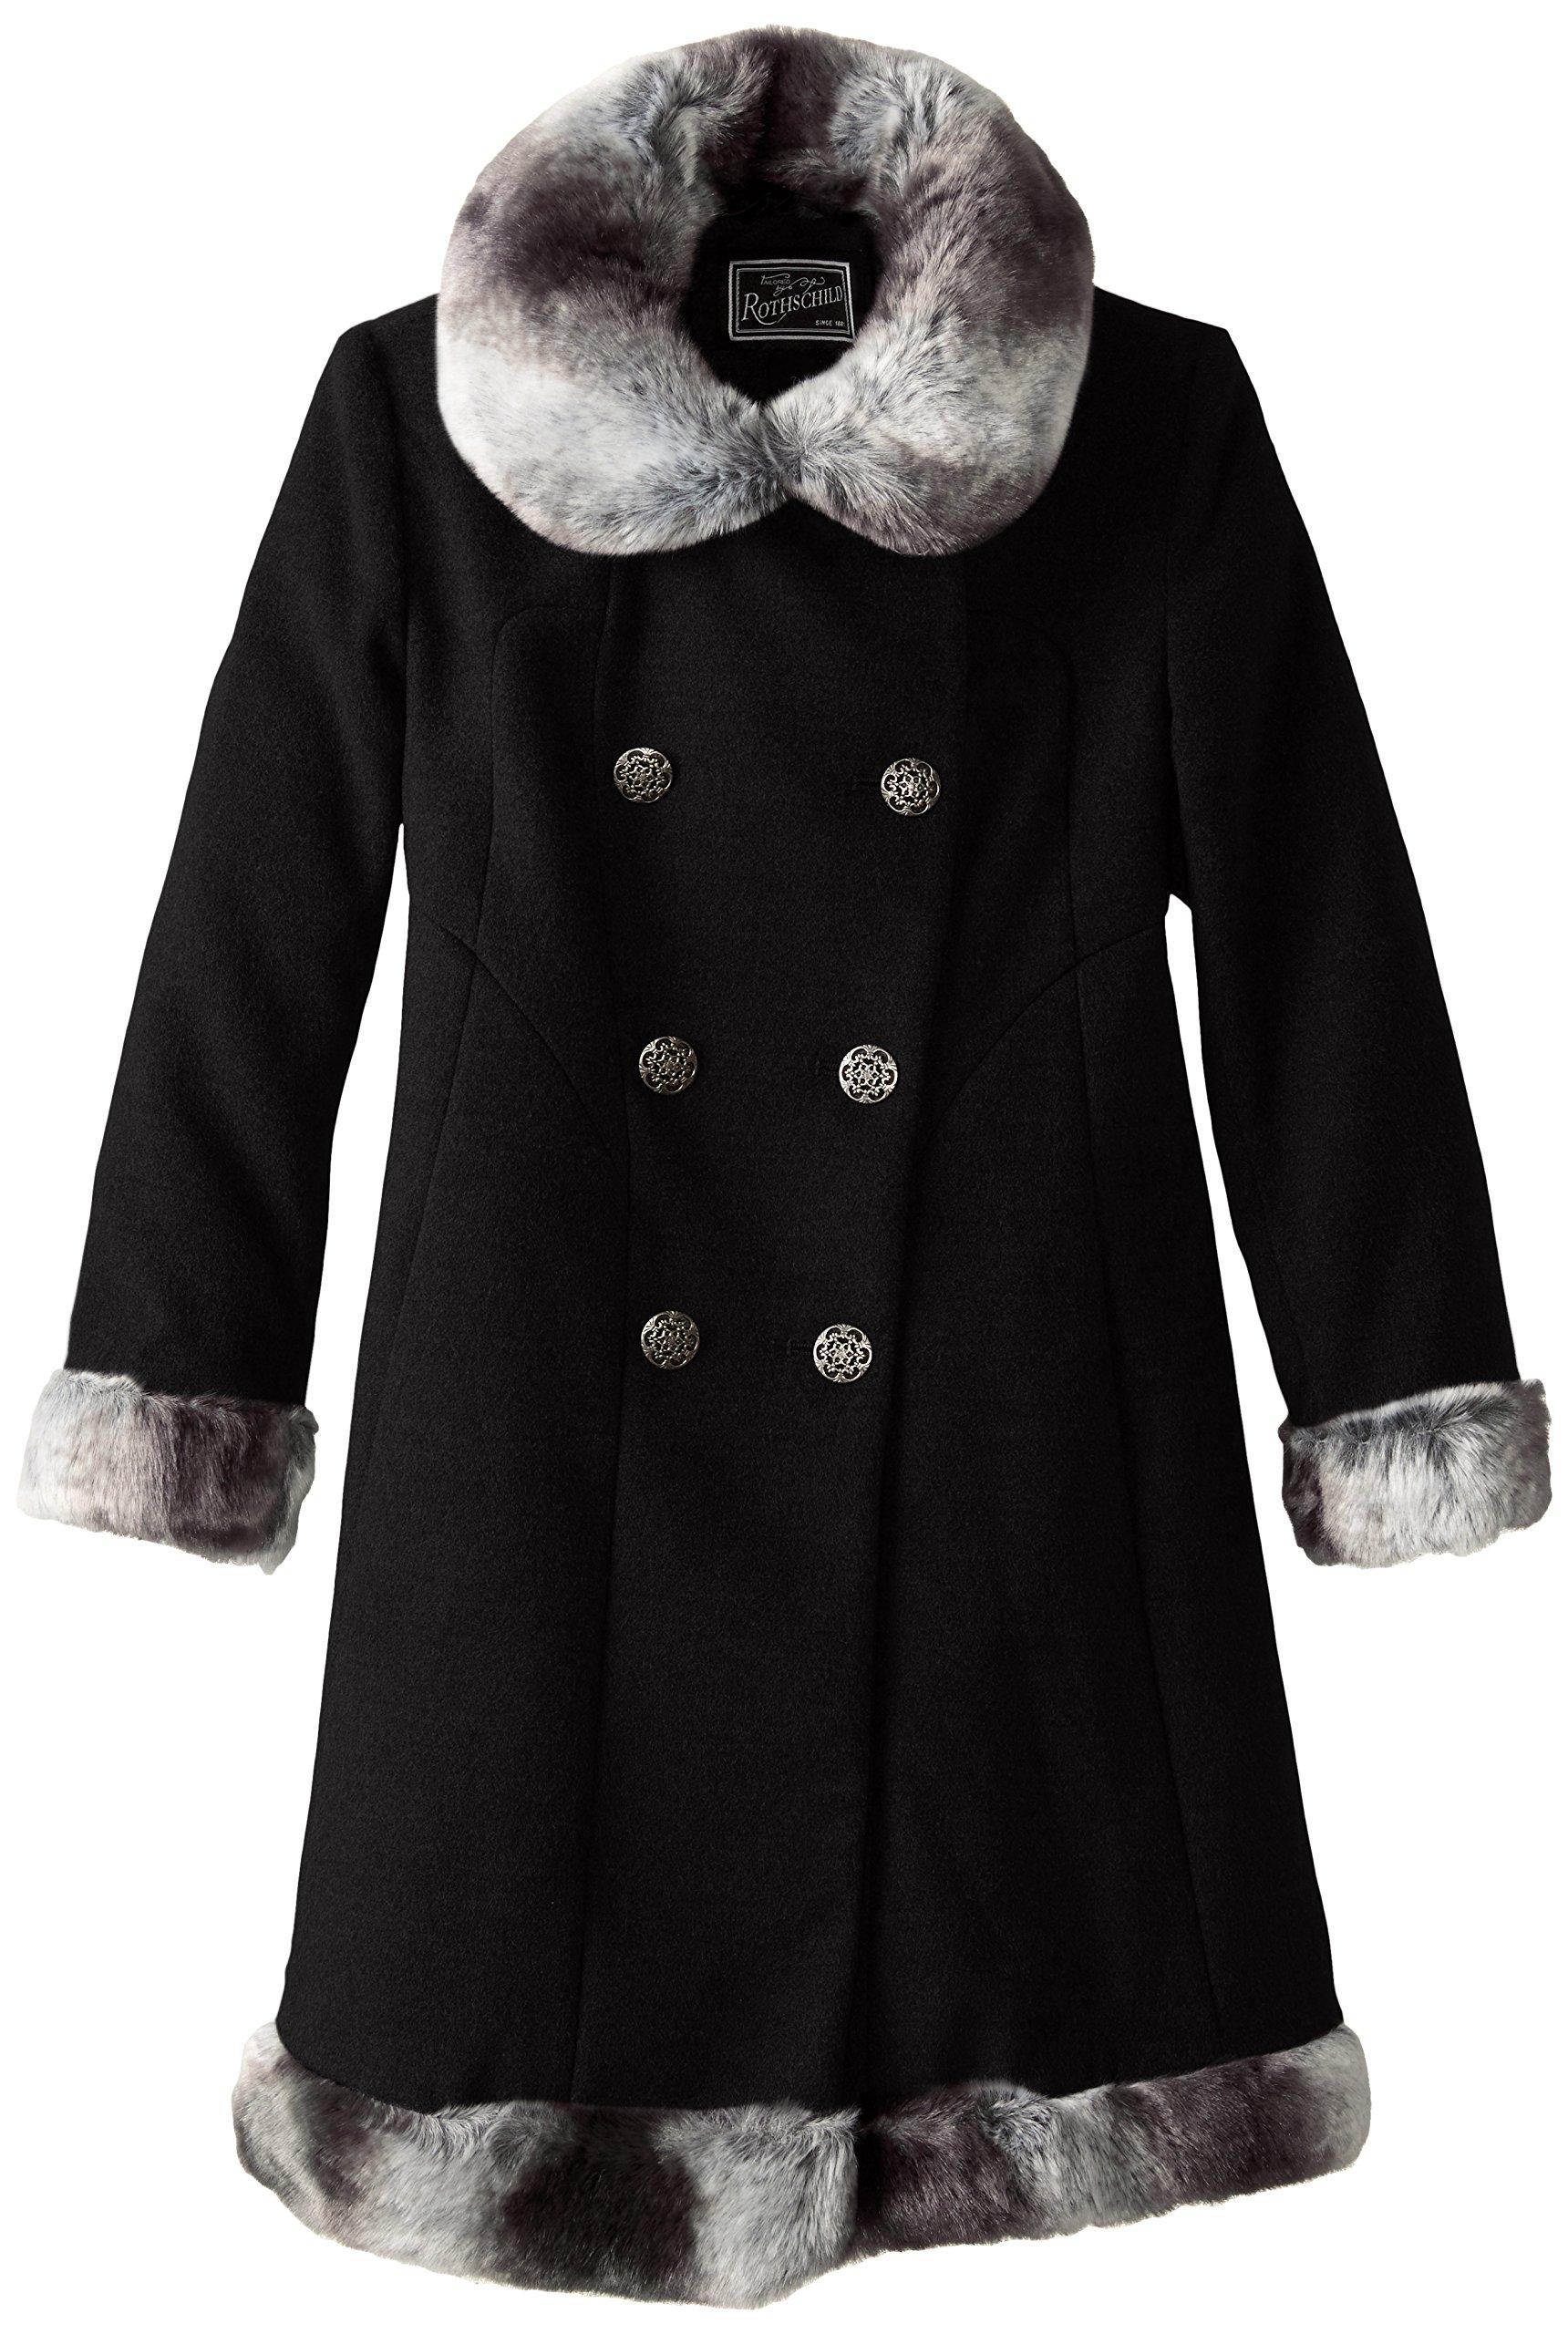 Rothschild Big Girls' Dressy Coat with Faux Fur Trim, Black, 8